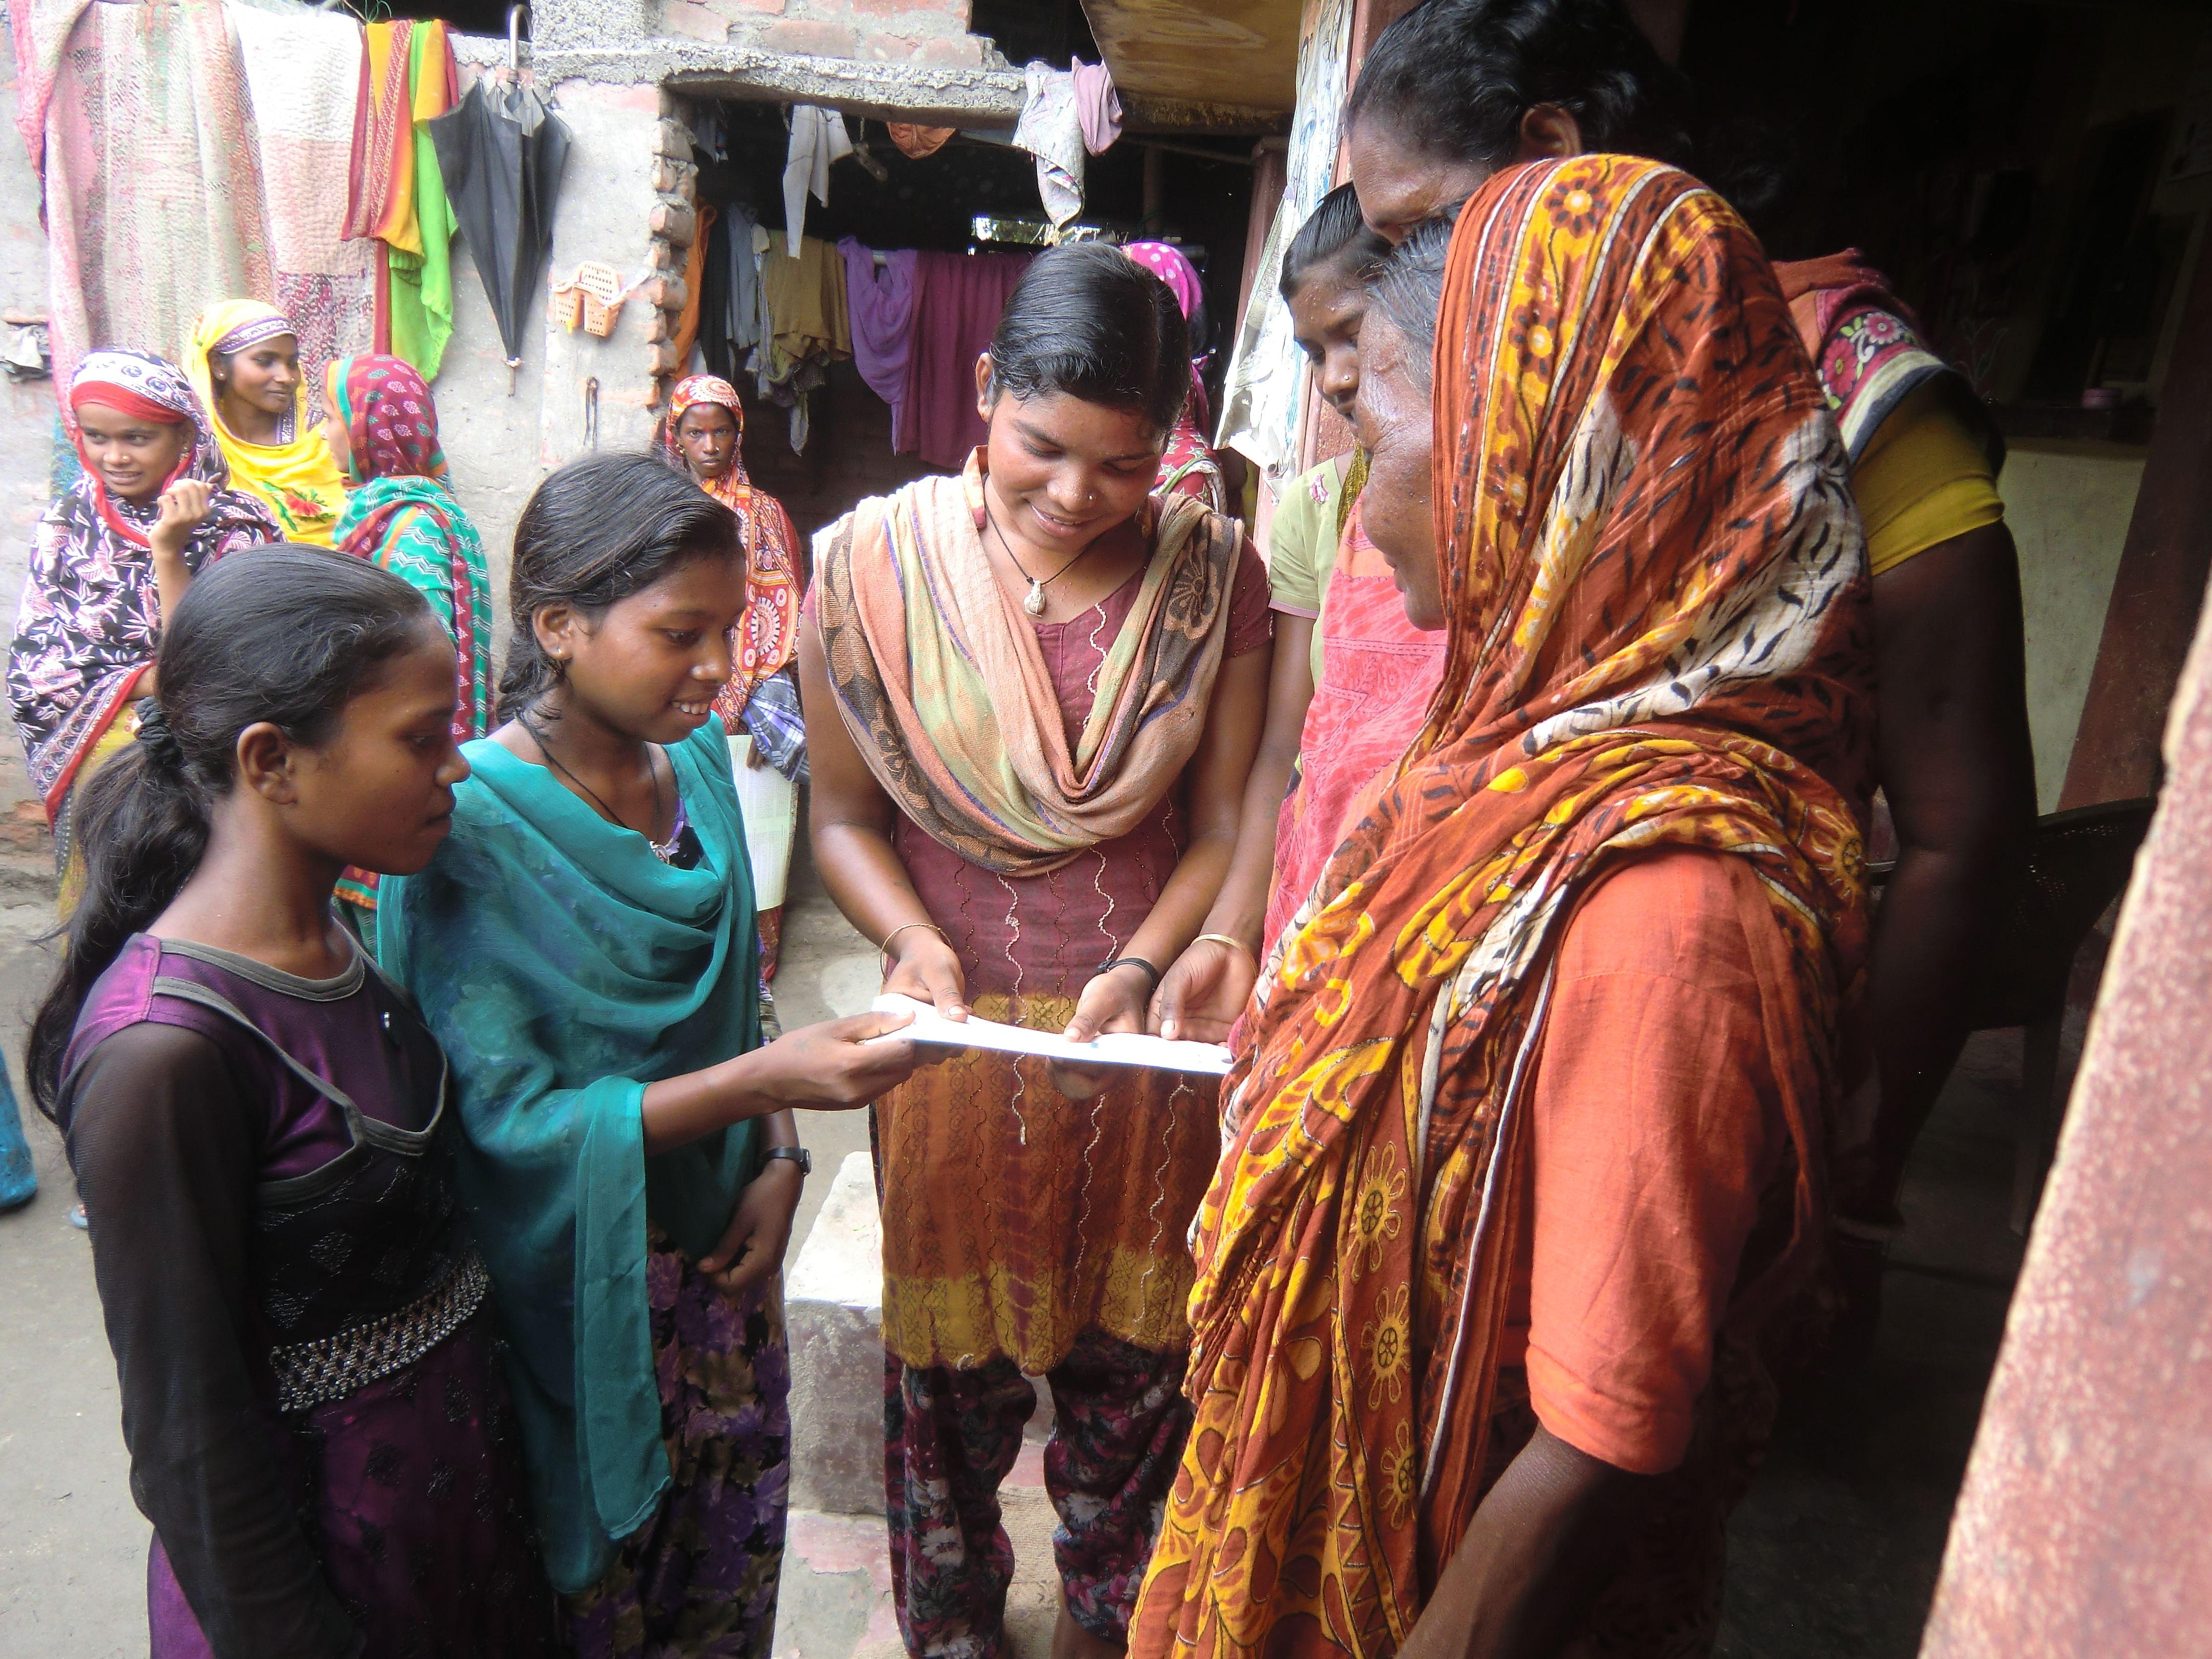 Girls of the Kishori group in Nooniya Basti, which falls under Mahingaon gram panchayat in Bihar's Kishanganj district, make door-to-door visits talking to women about family planning, safe motherhood and the importance of eating nutritious meals. (Credit: Ajitha Menon\WFS)